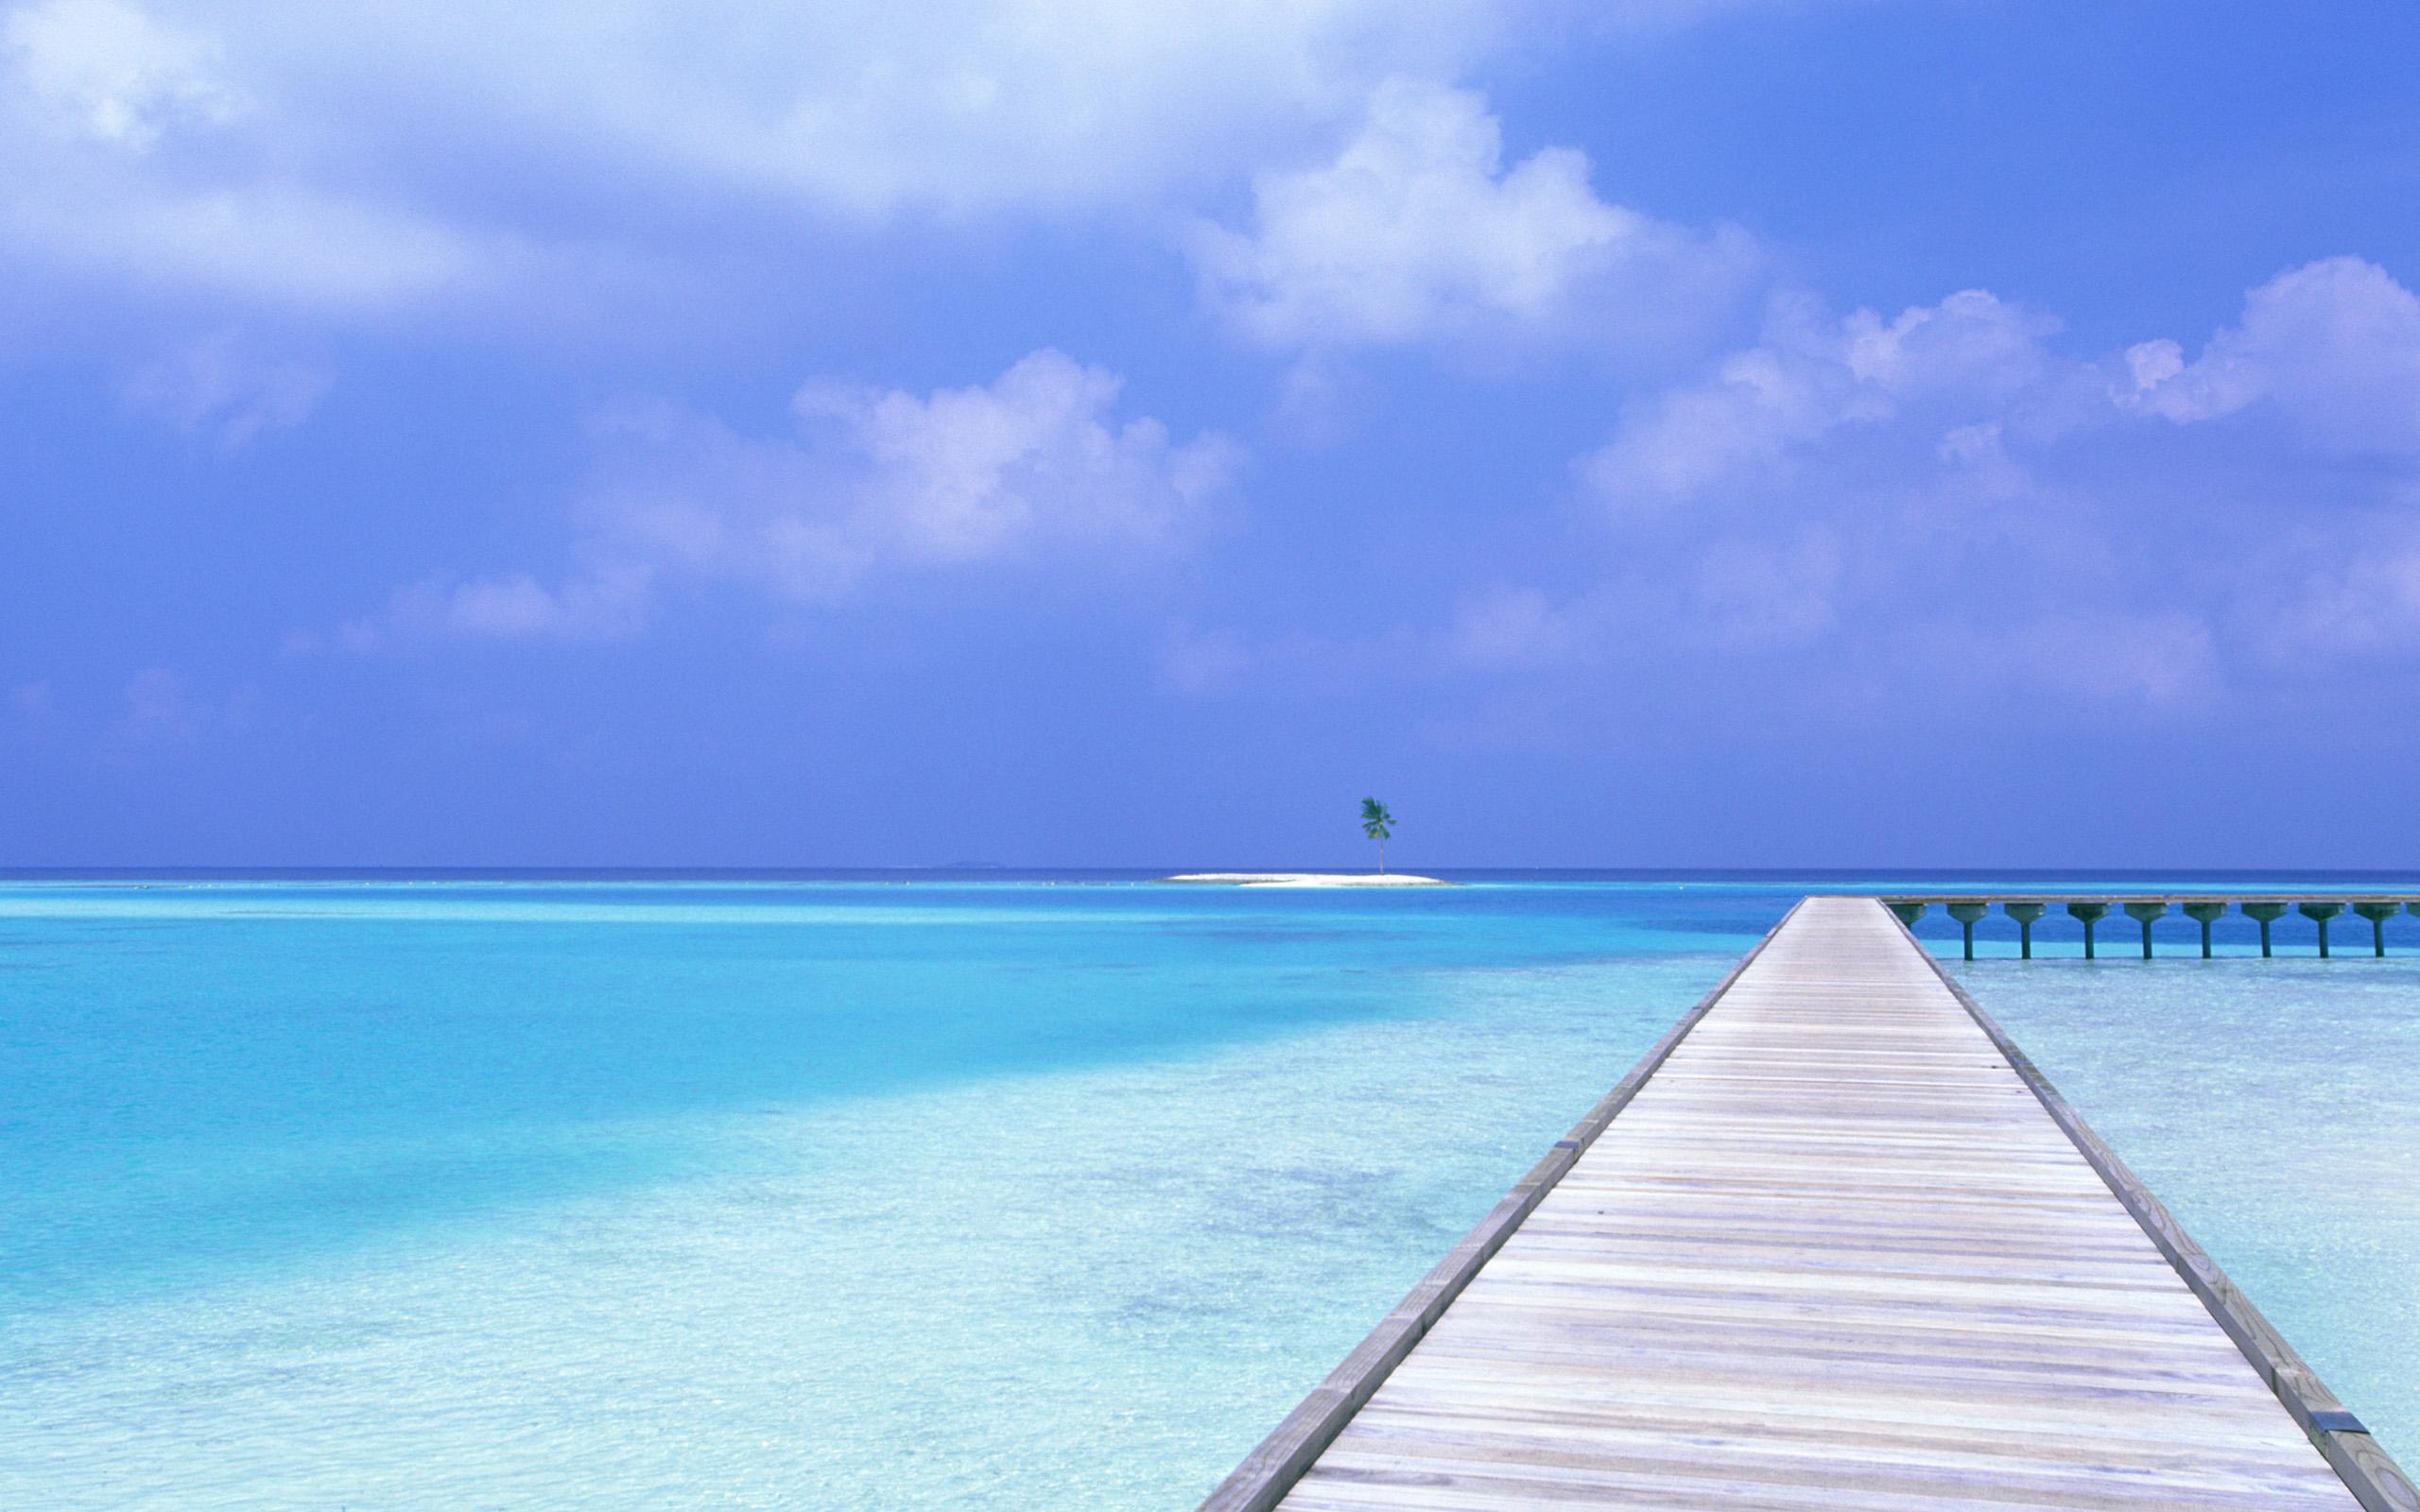 Maldives Wallpapers, Maldives Beach, Island Wallpaper